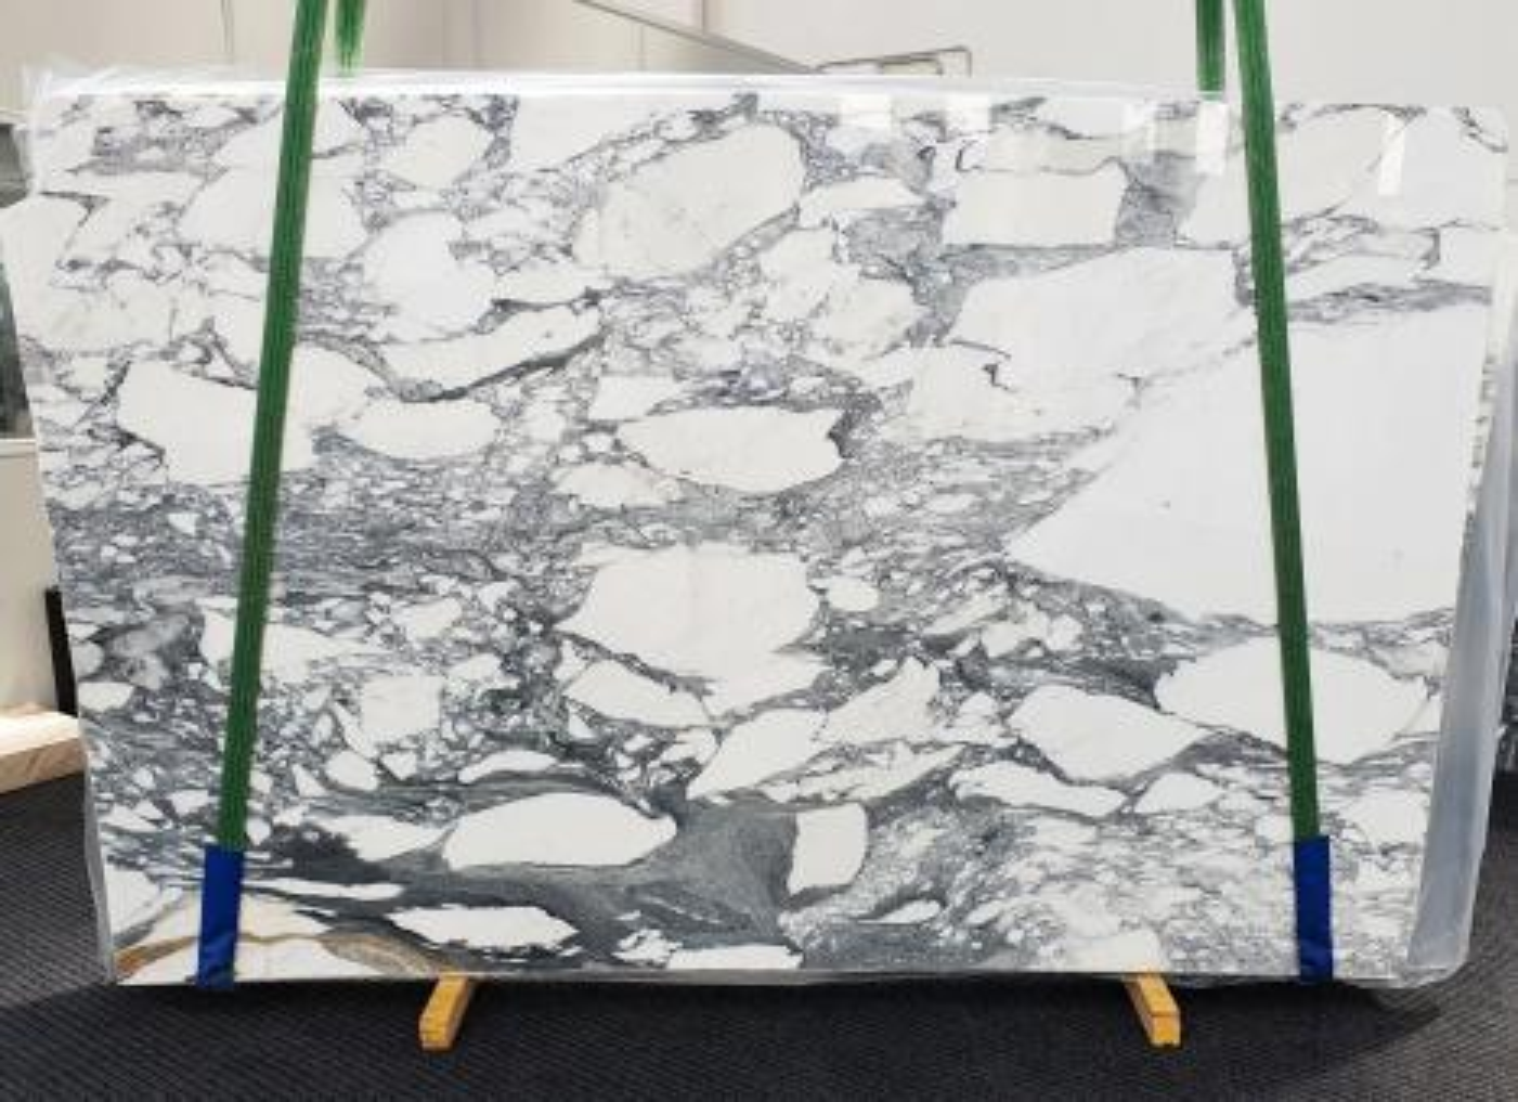 ARABESCATO CORCHIA Supply Veneto (Italy) polished slabs 1433 , Slab #17 natural marble